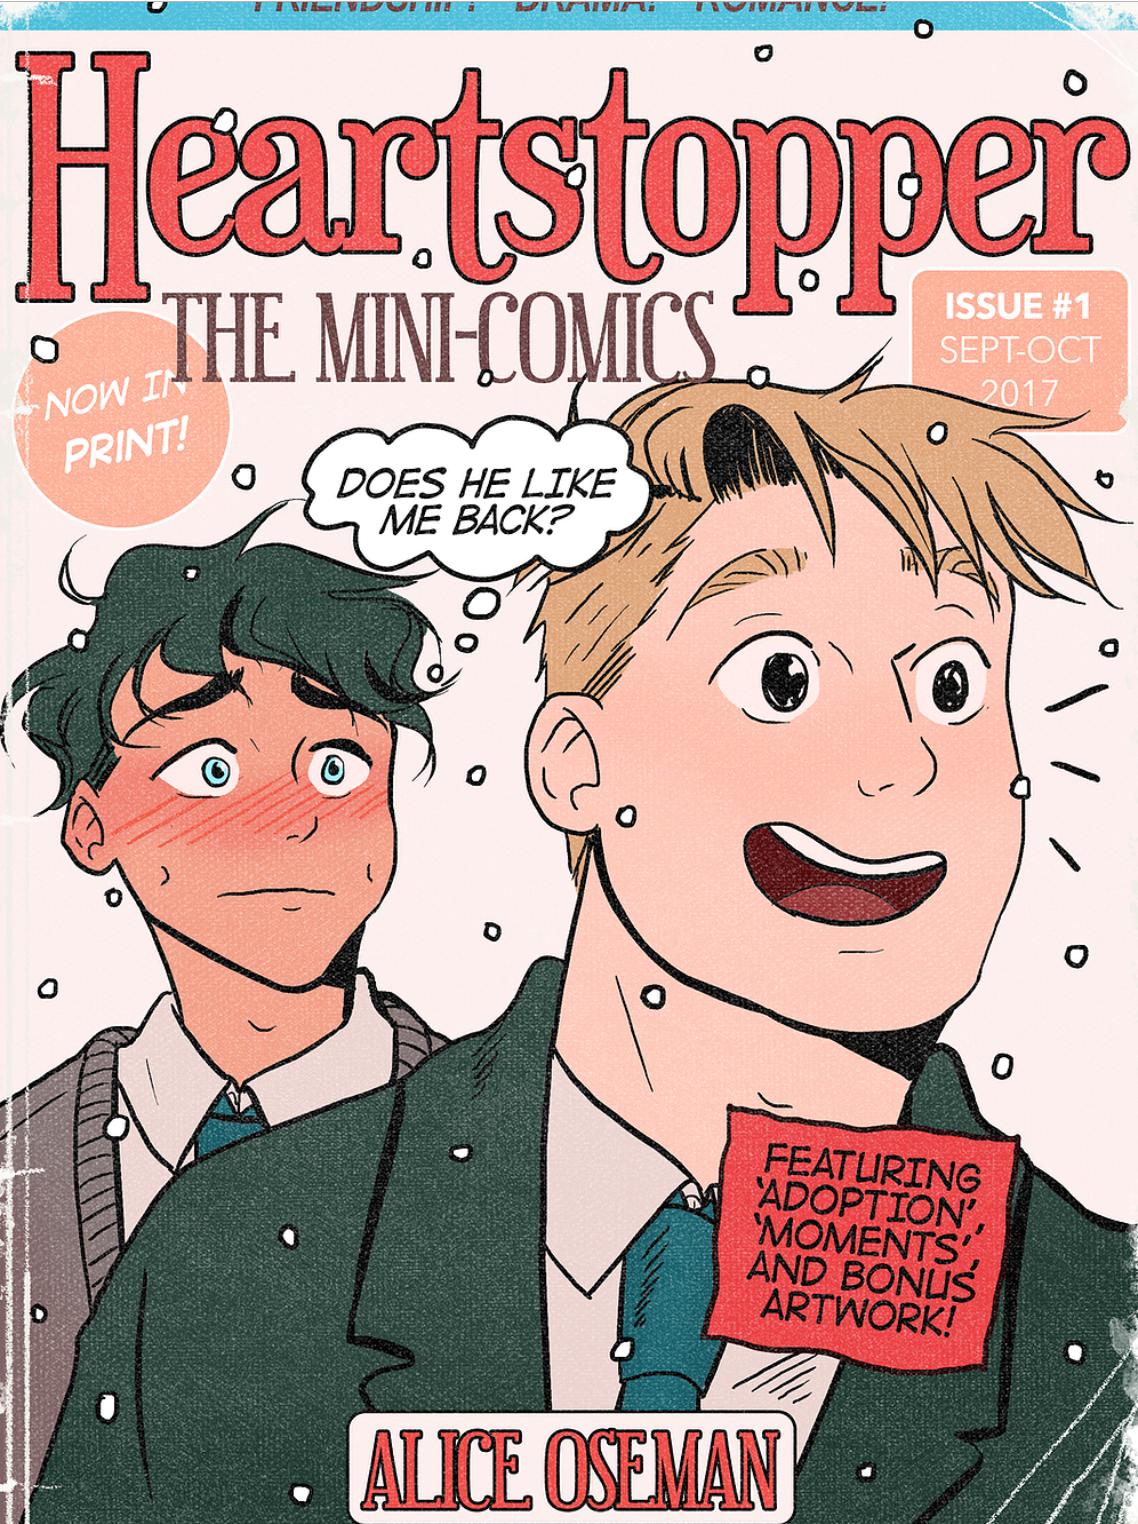 Heartstopper: Mini-Comics